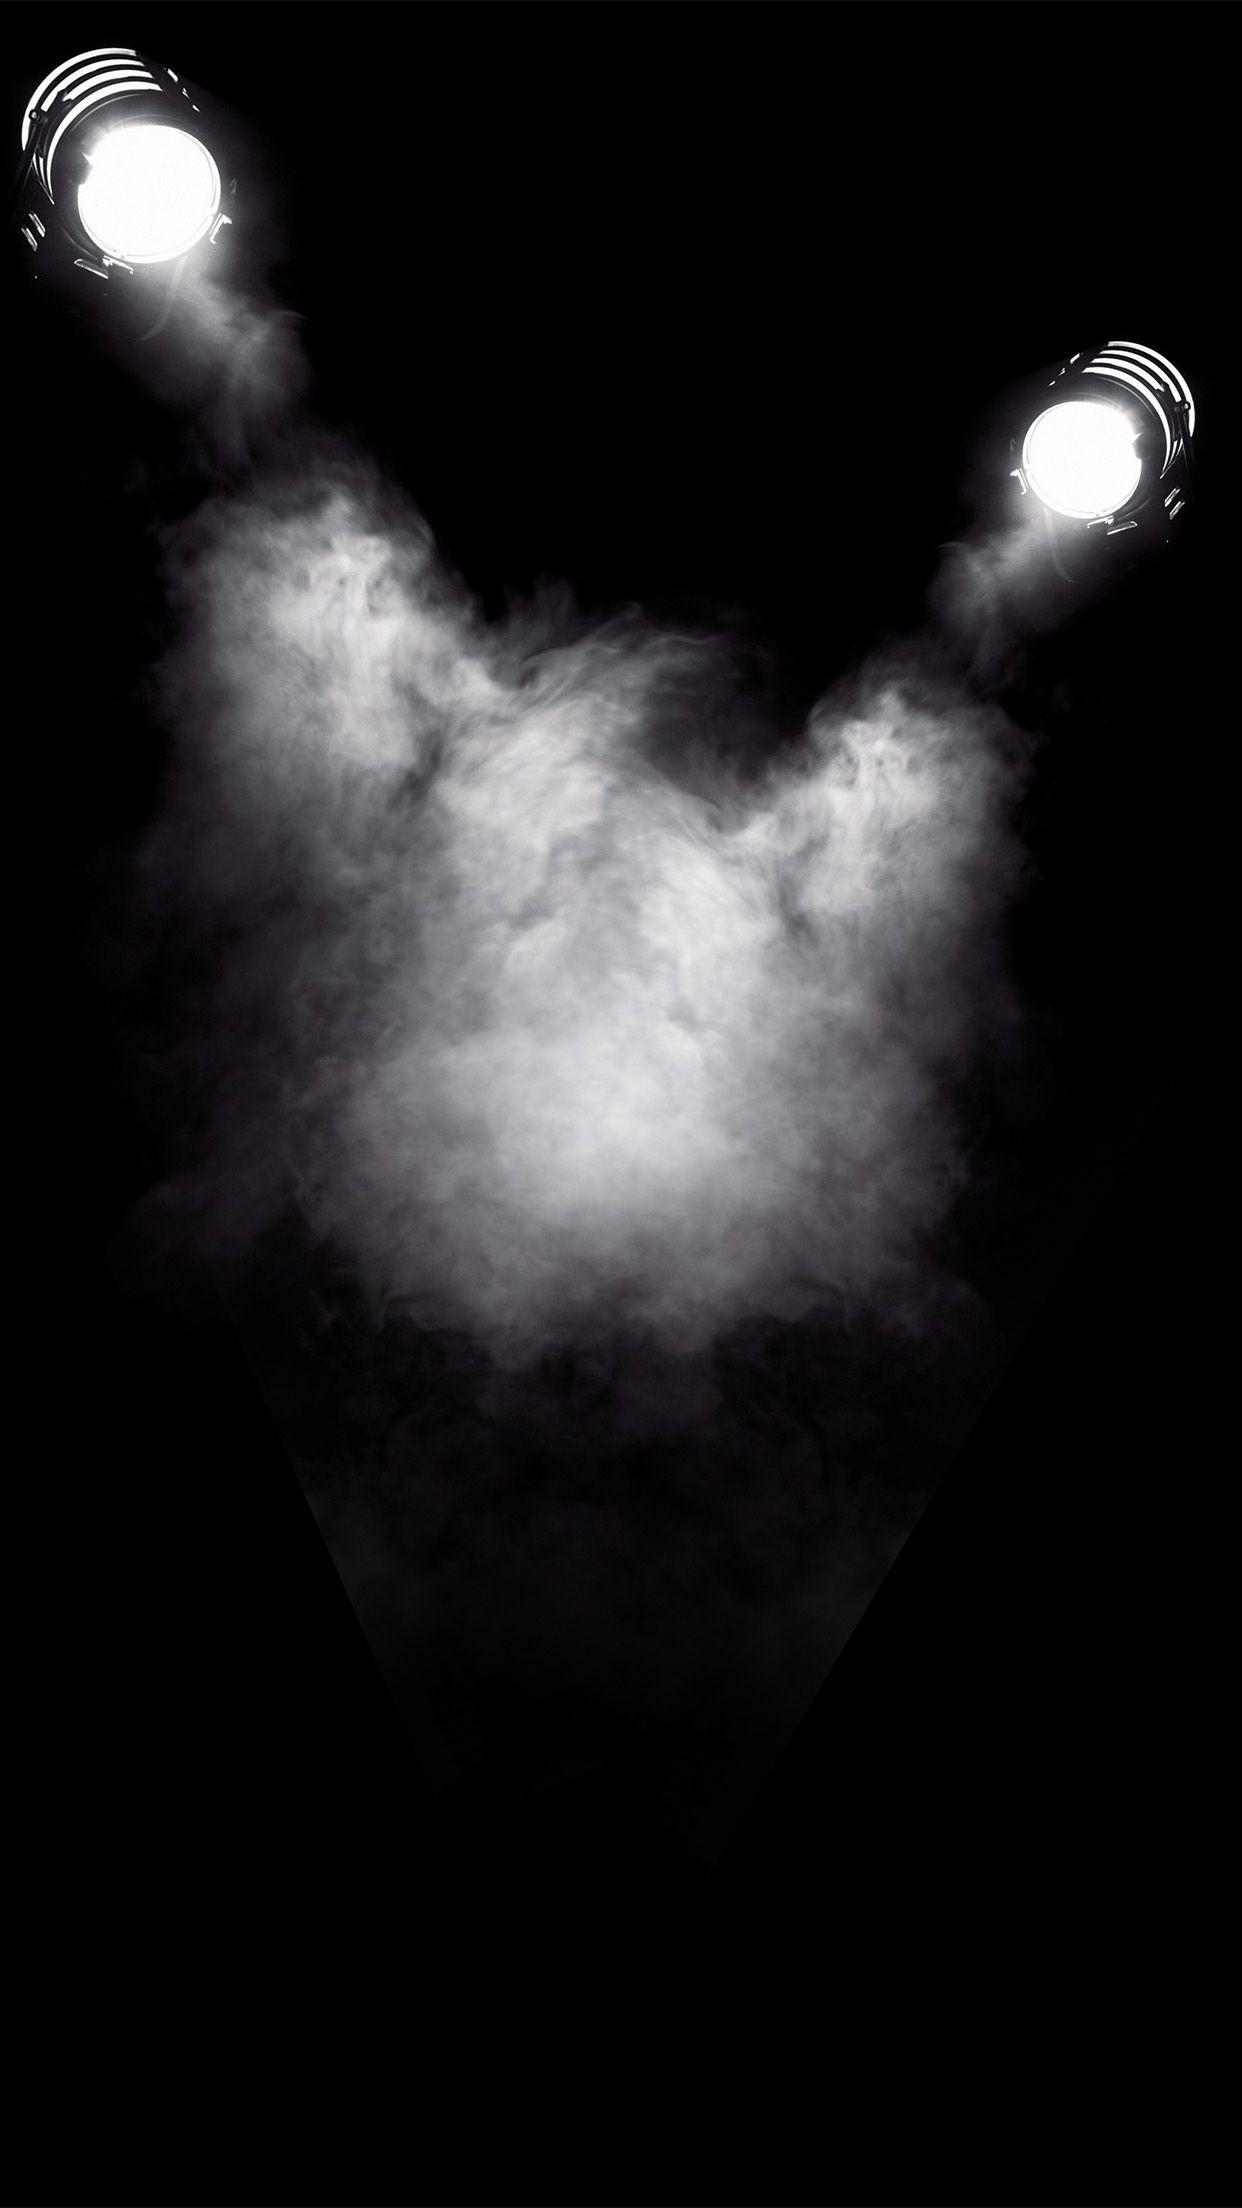 الدخان سحابة القمر أسود الخلفية Black Backgrounds Black Background Images Colorful Backgrounds